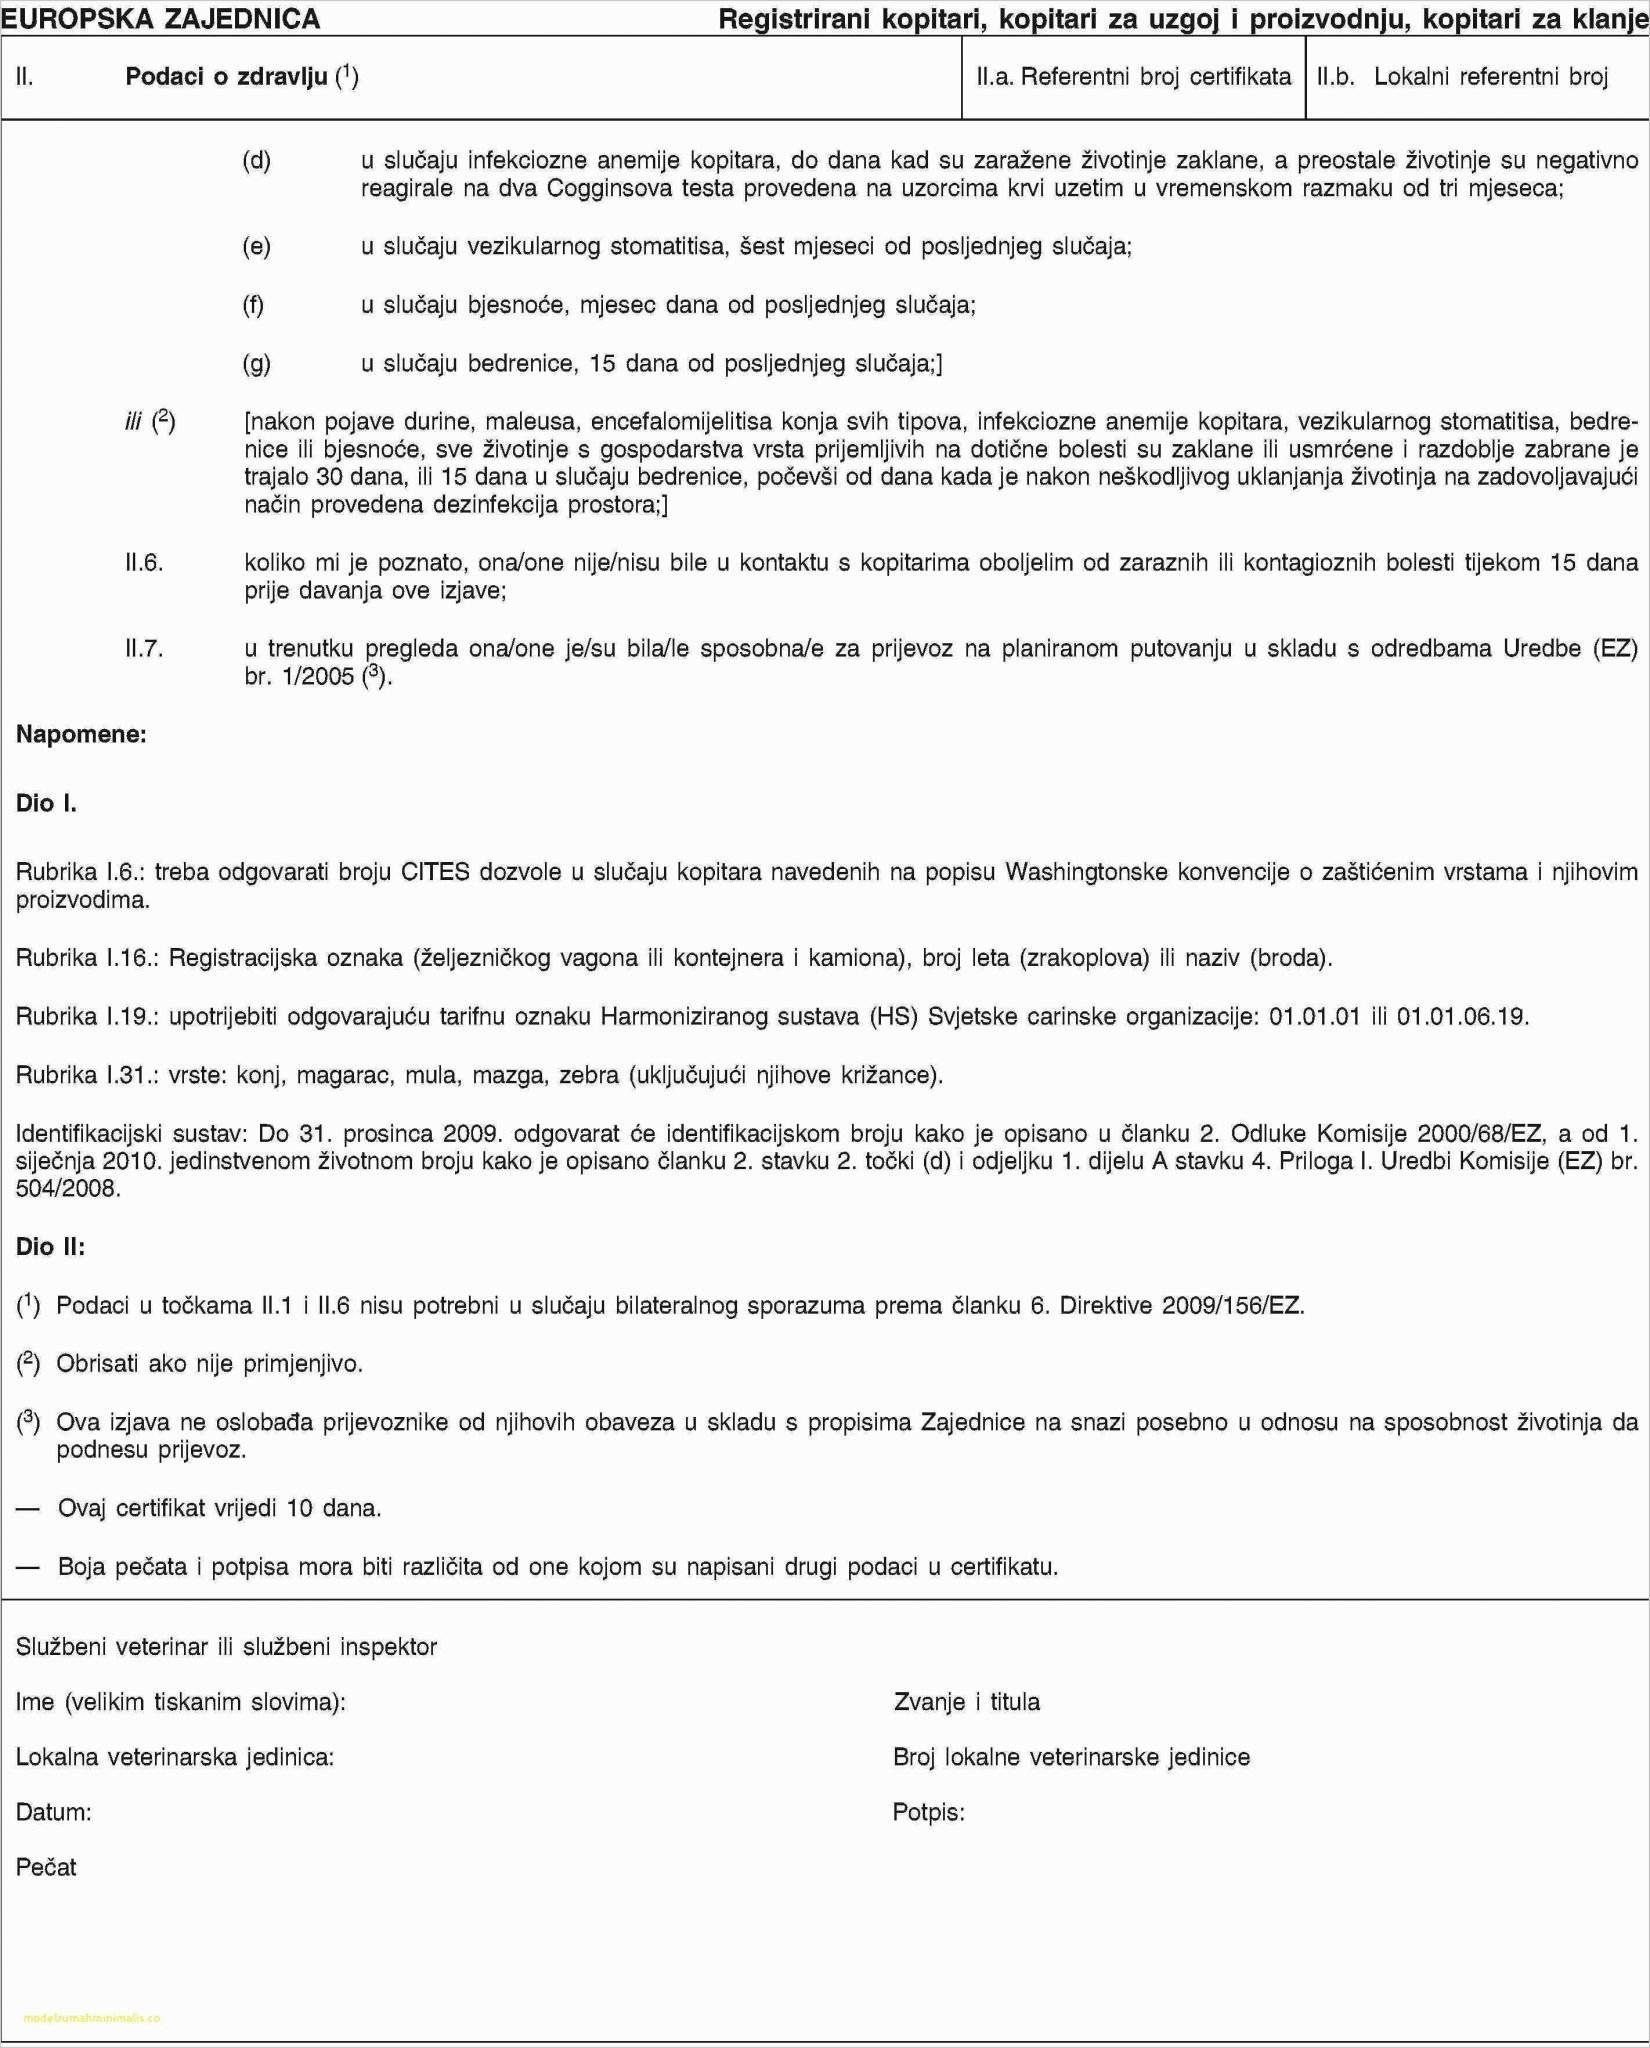 U S Customs Vehicle Export Worksheet  Briefencounters Throughout U S Customs Vehicle Export Worksheet